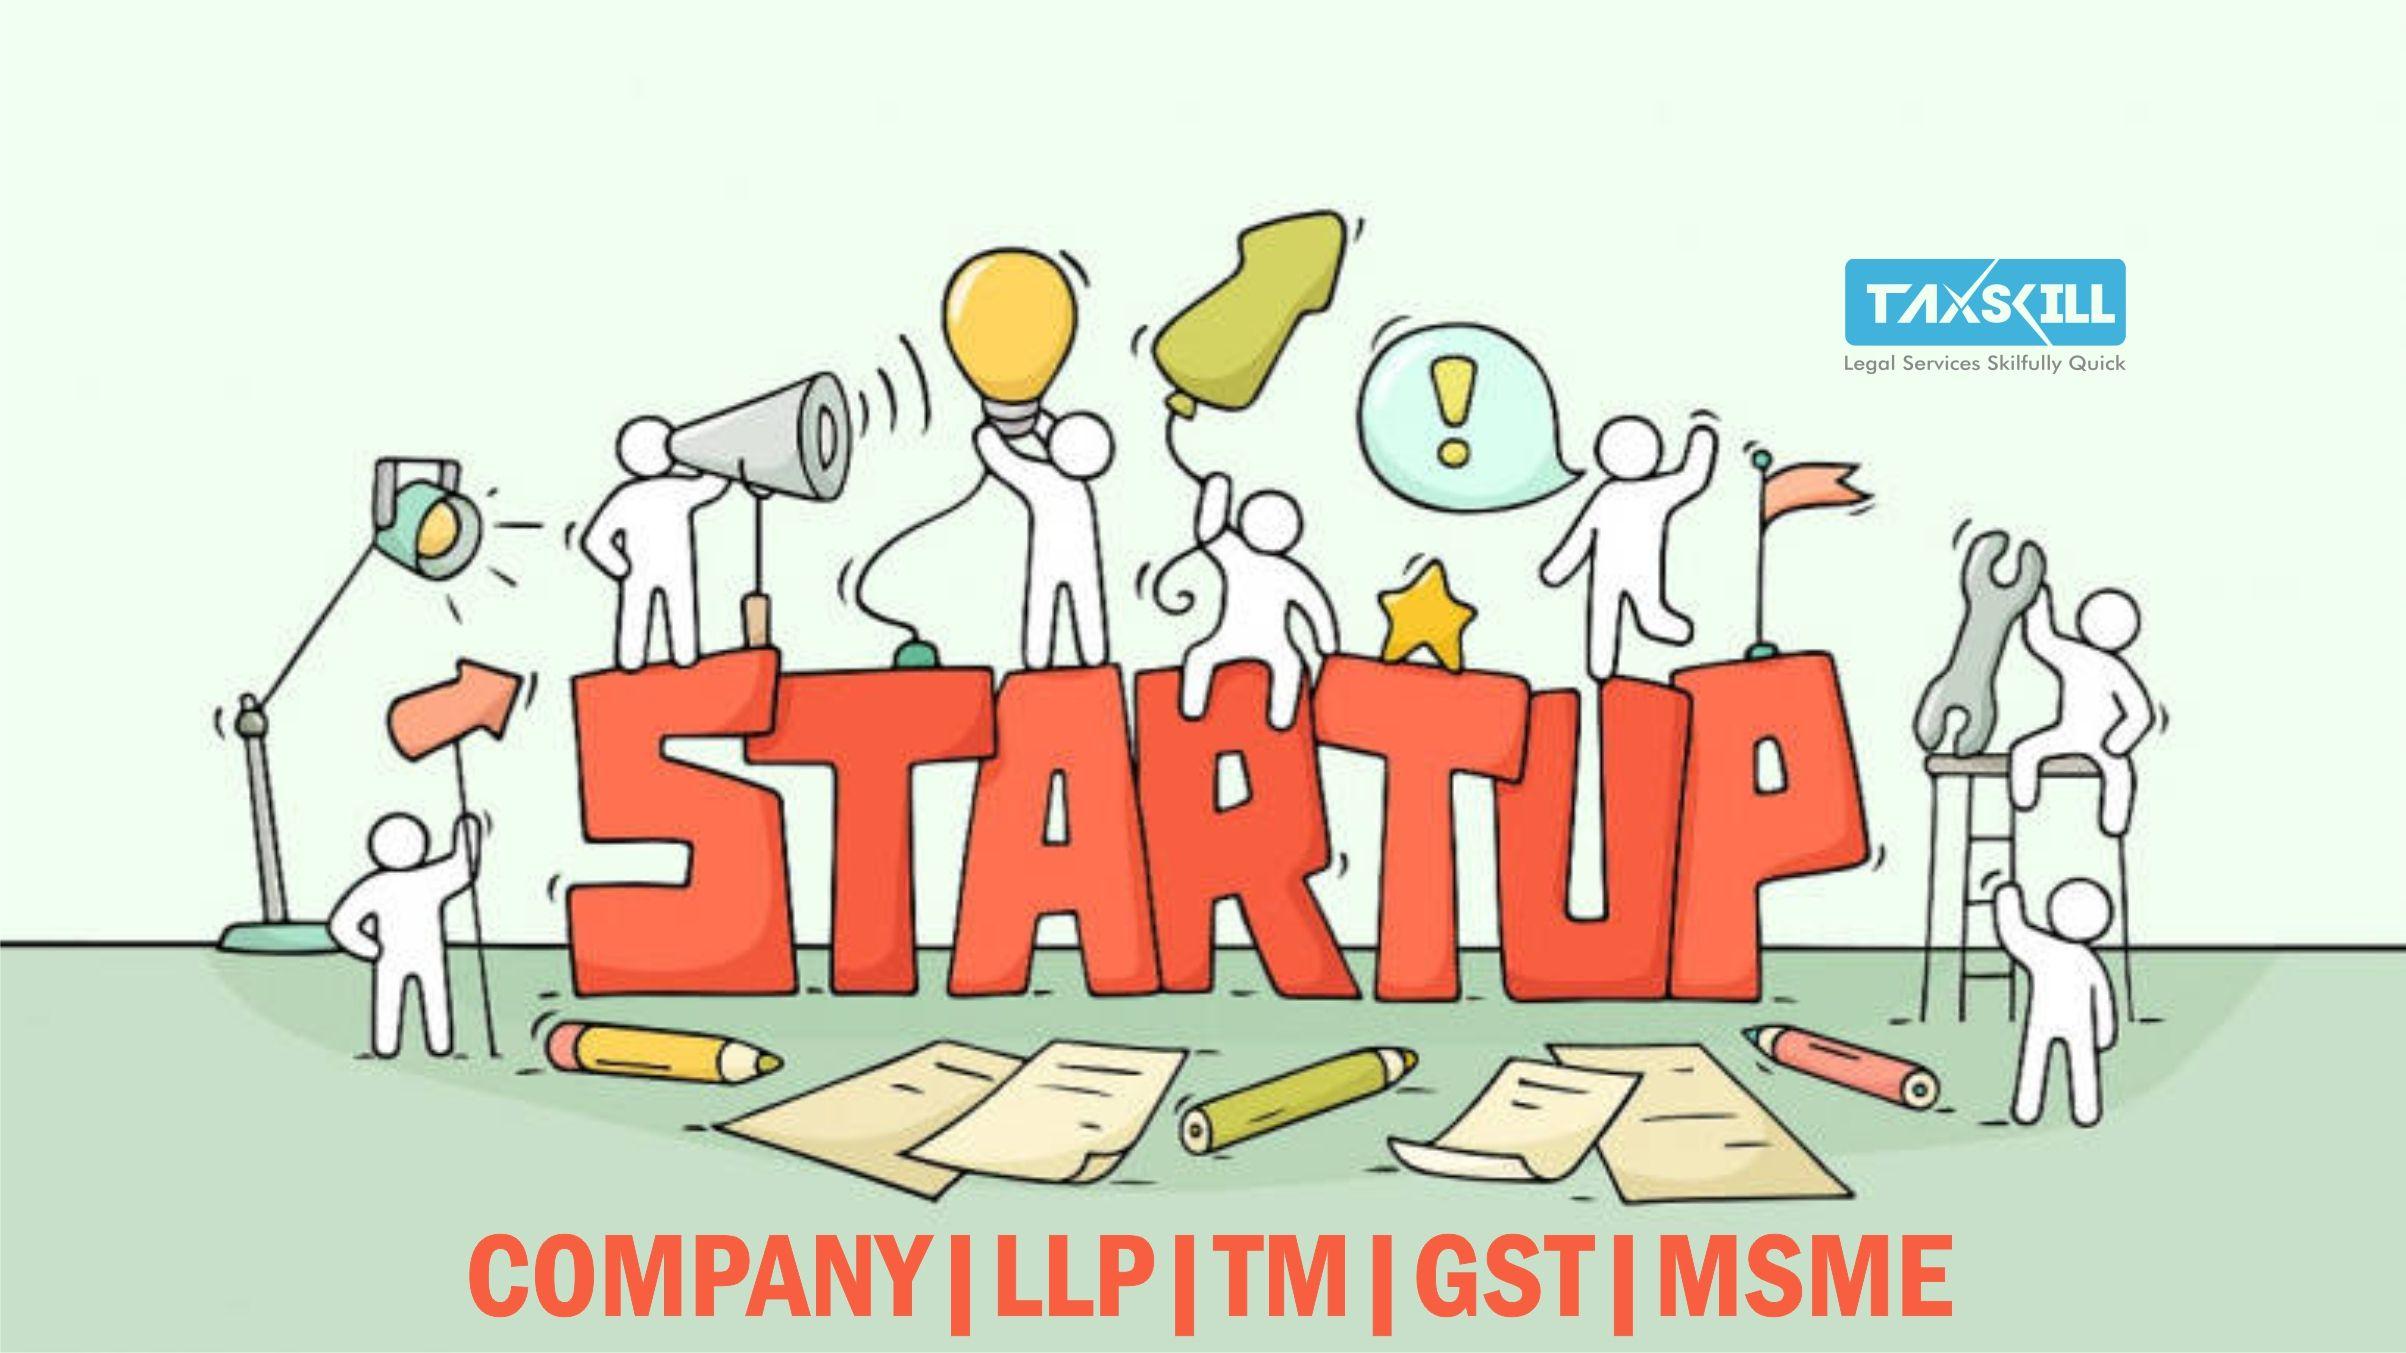 Startupindia Digitalindia Funding Taxskill Https Www Taxskill Com Start Up Travel Guide Business Expansion